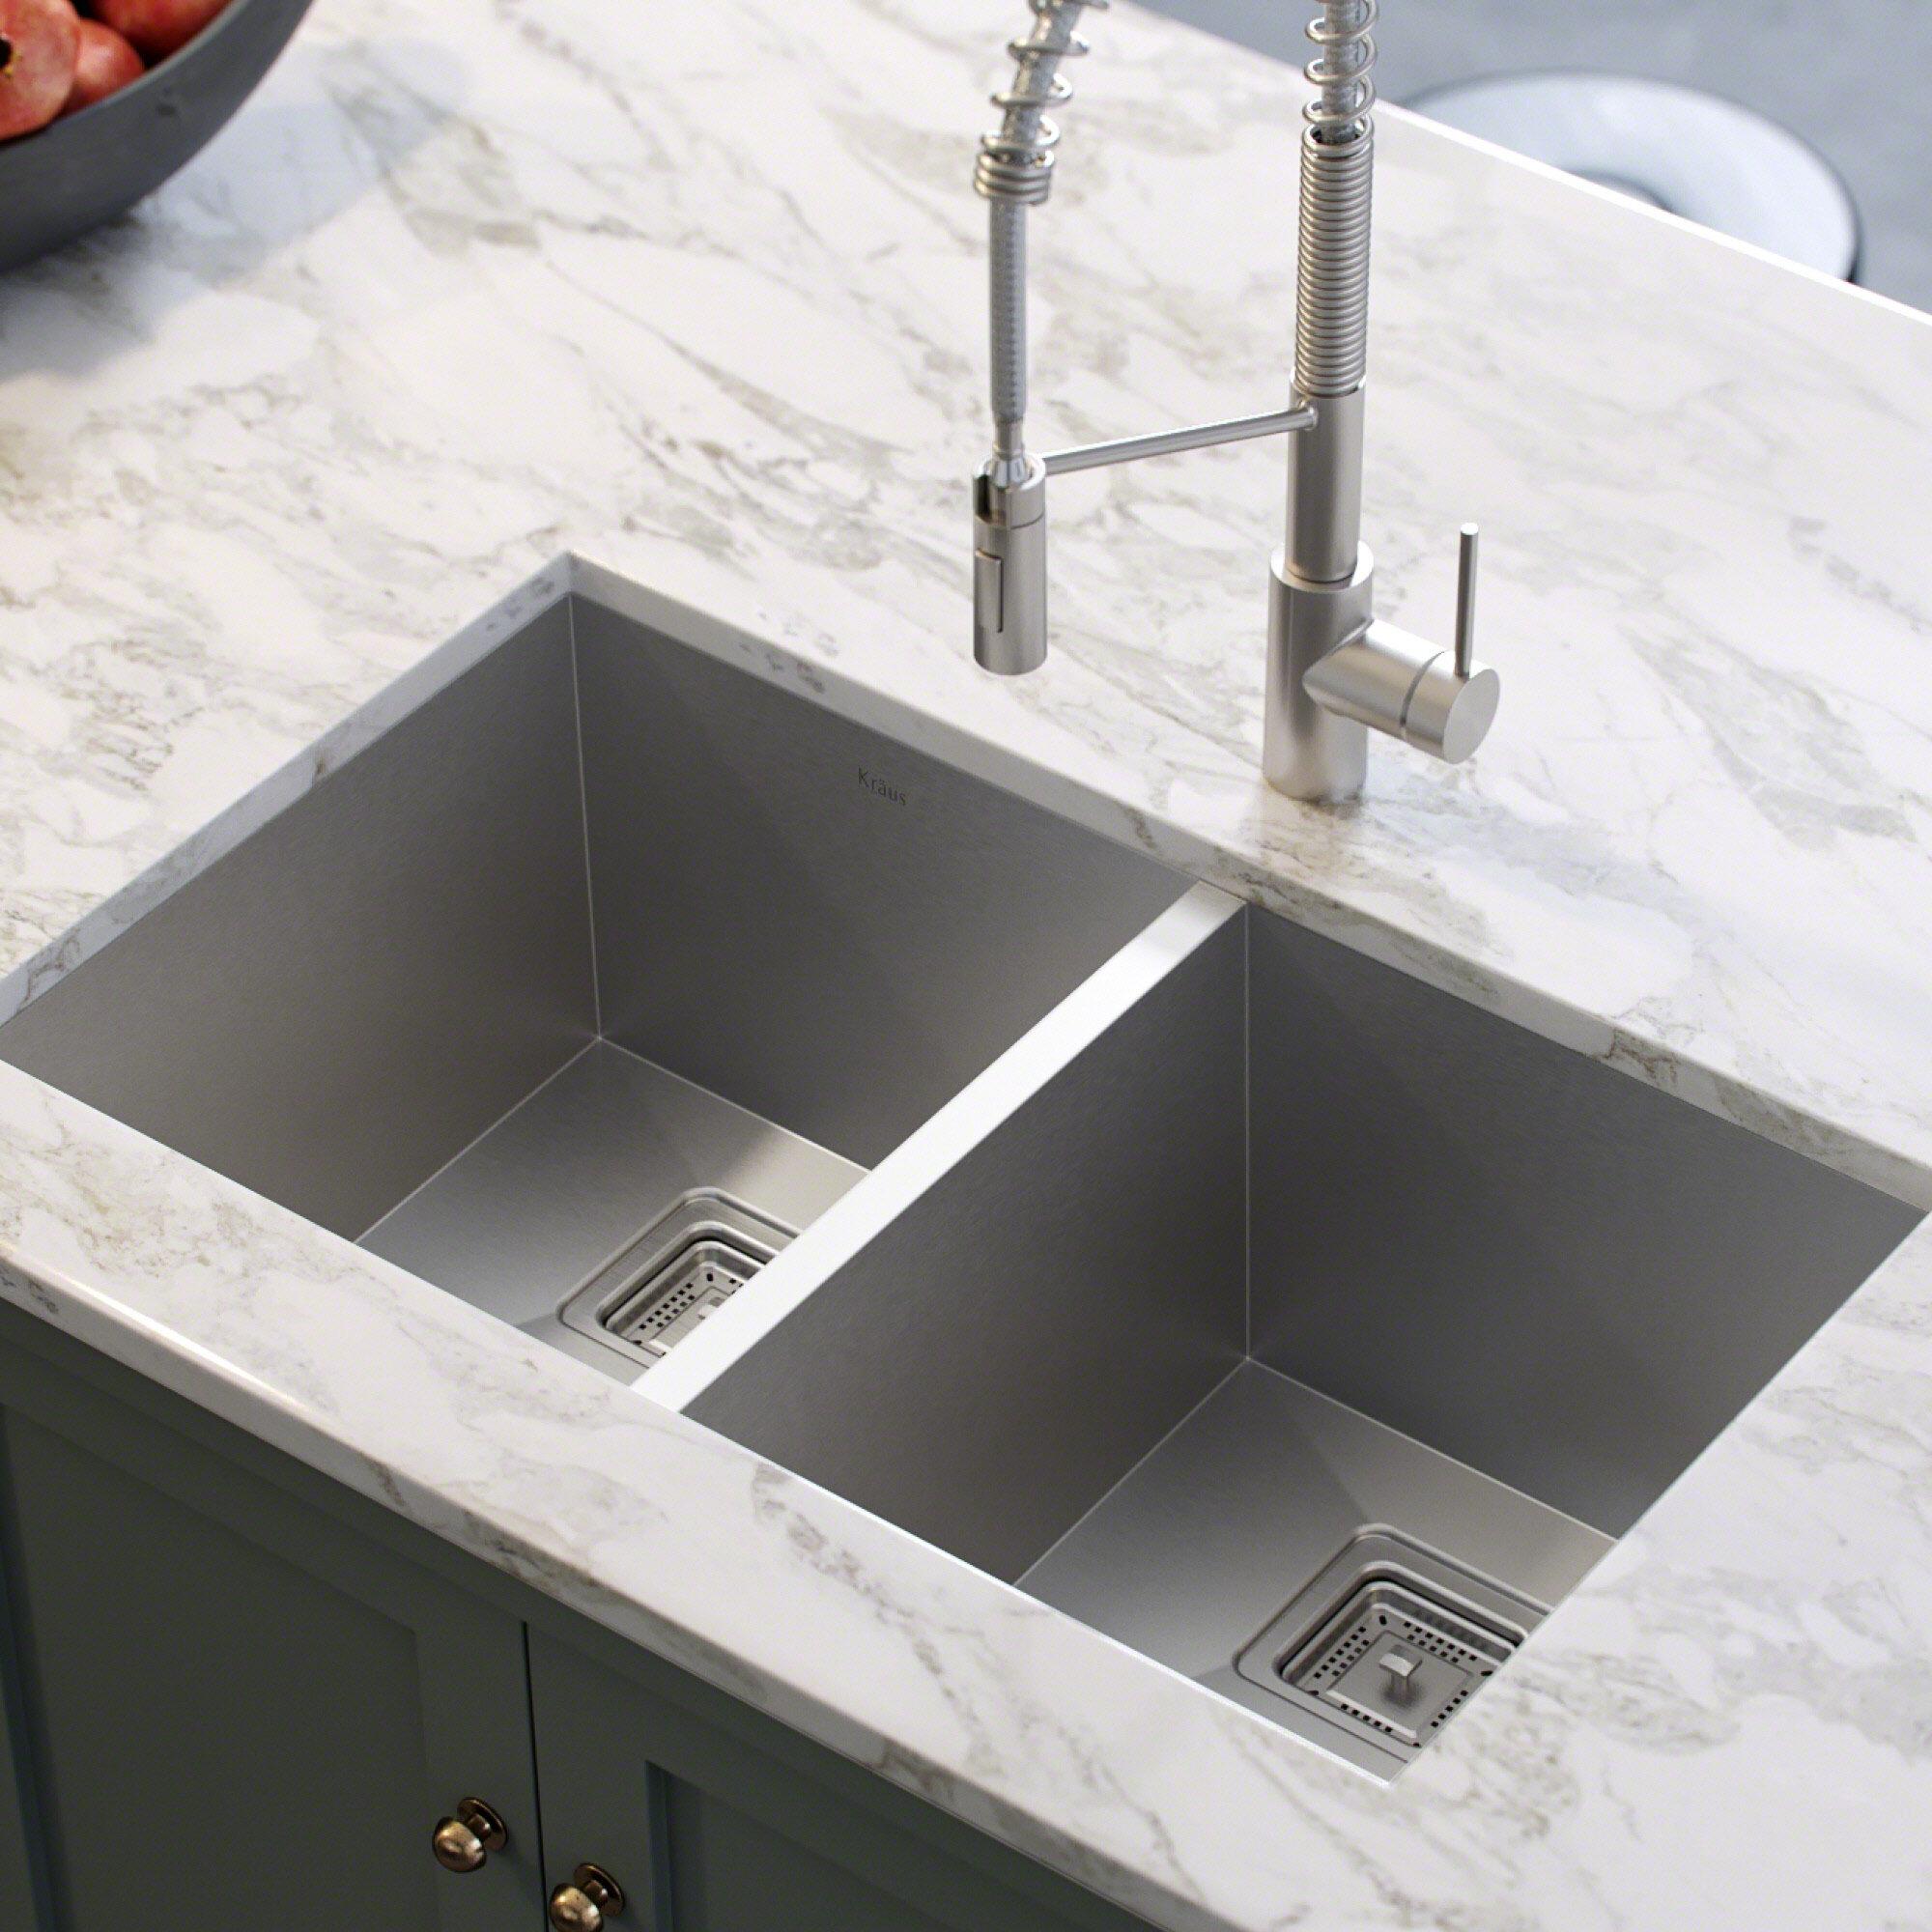 khu322 kraus pax 31 5 x 18 5 double basin undermount kitchen sink rh wayfair com kitchen sinks double kitchen sinks double drainer